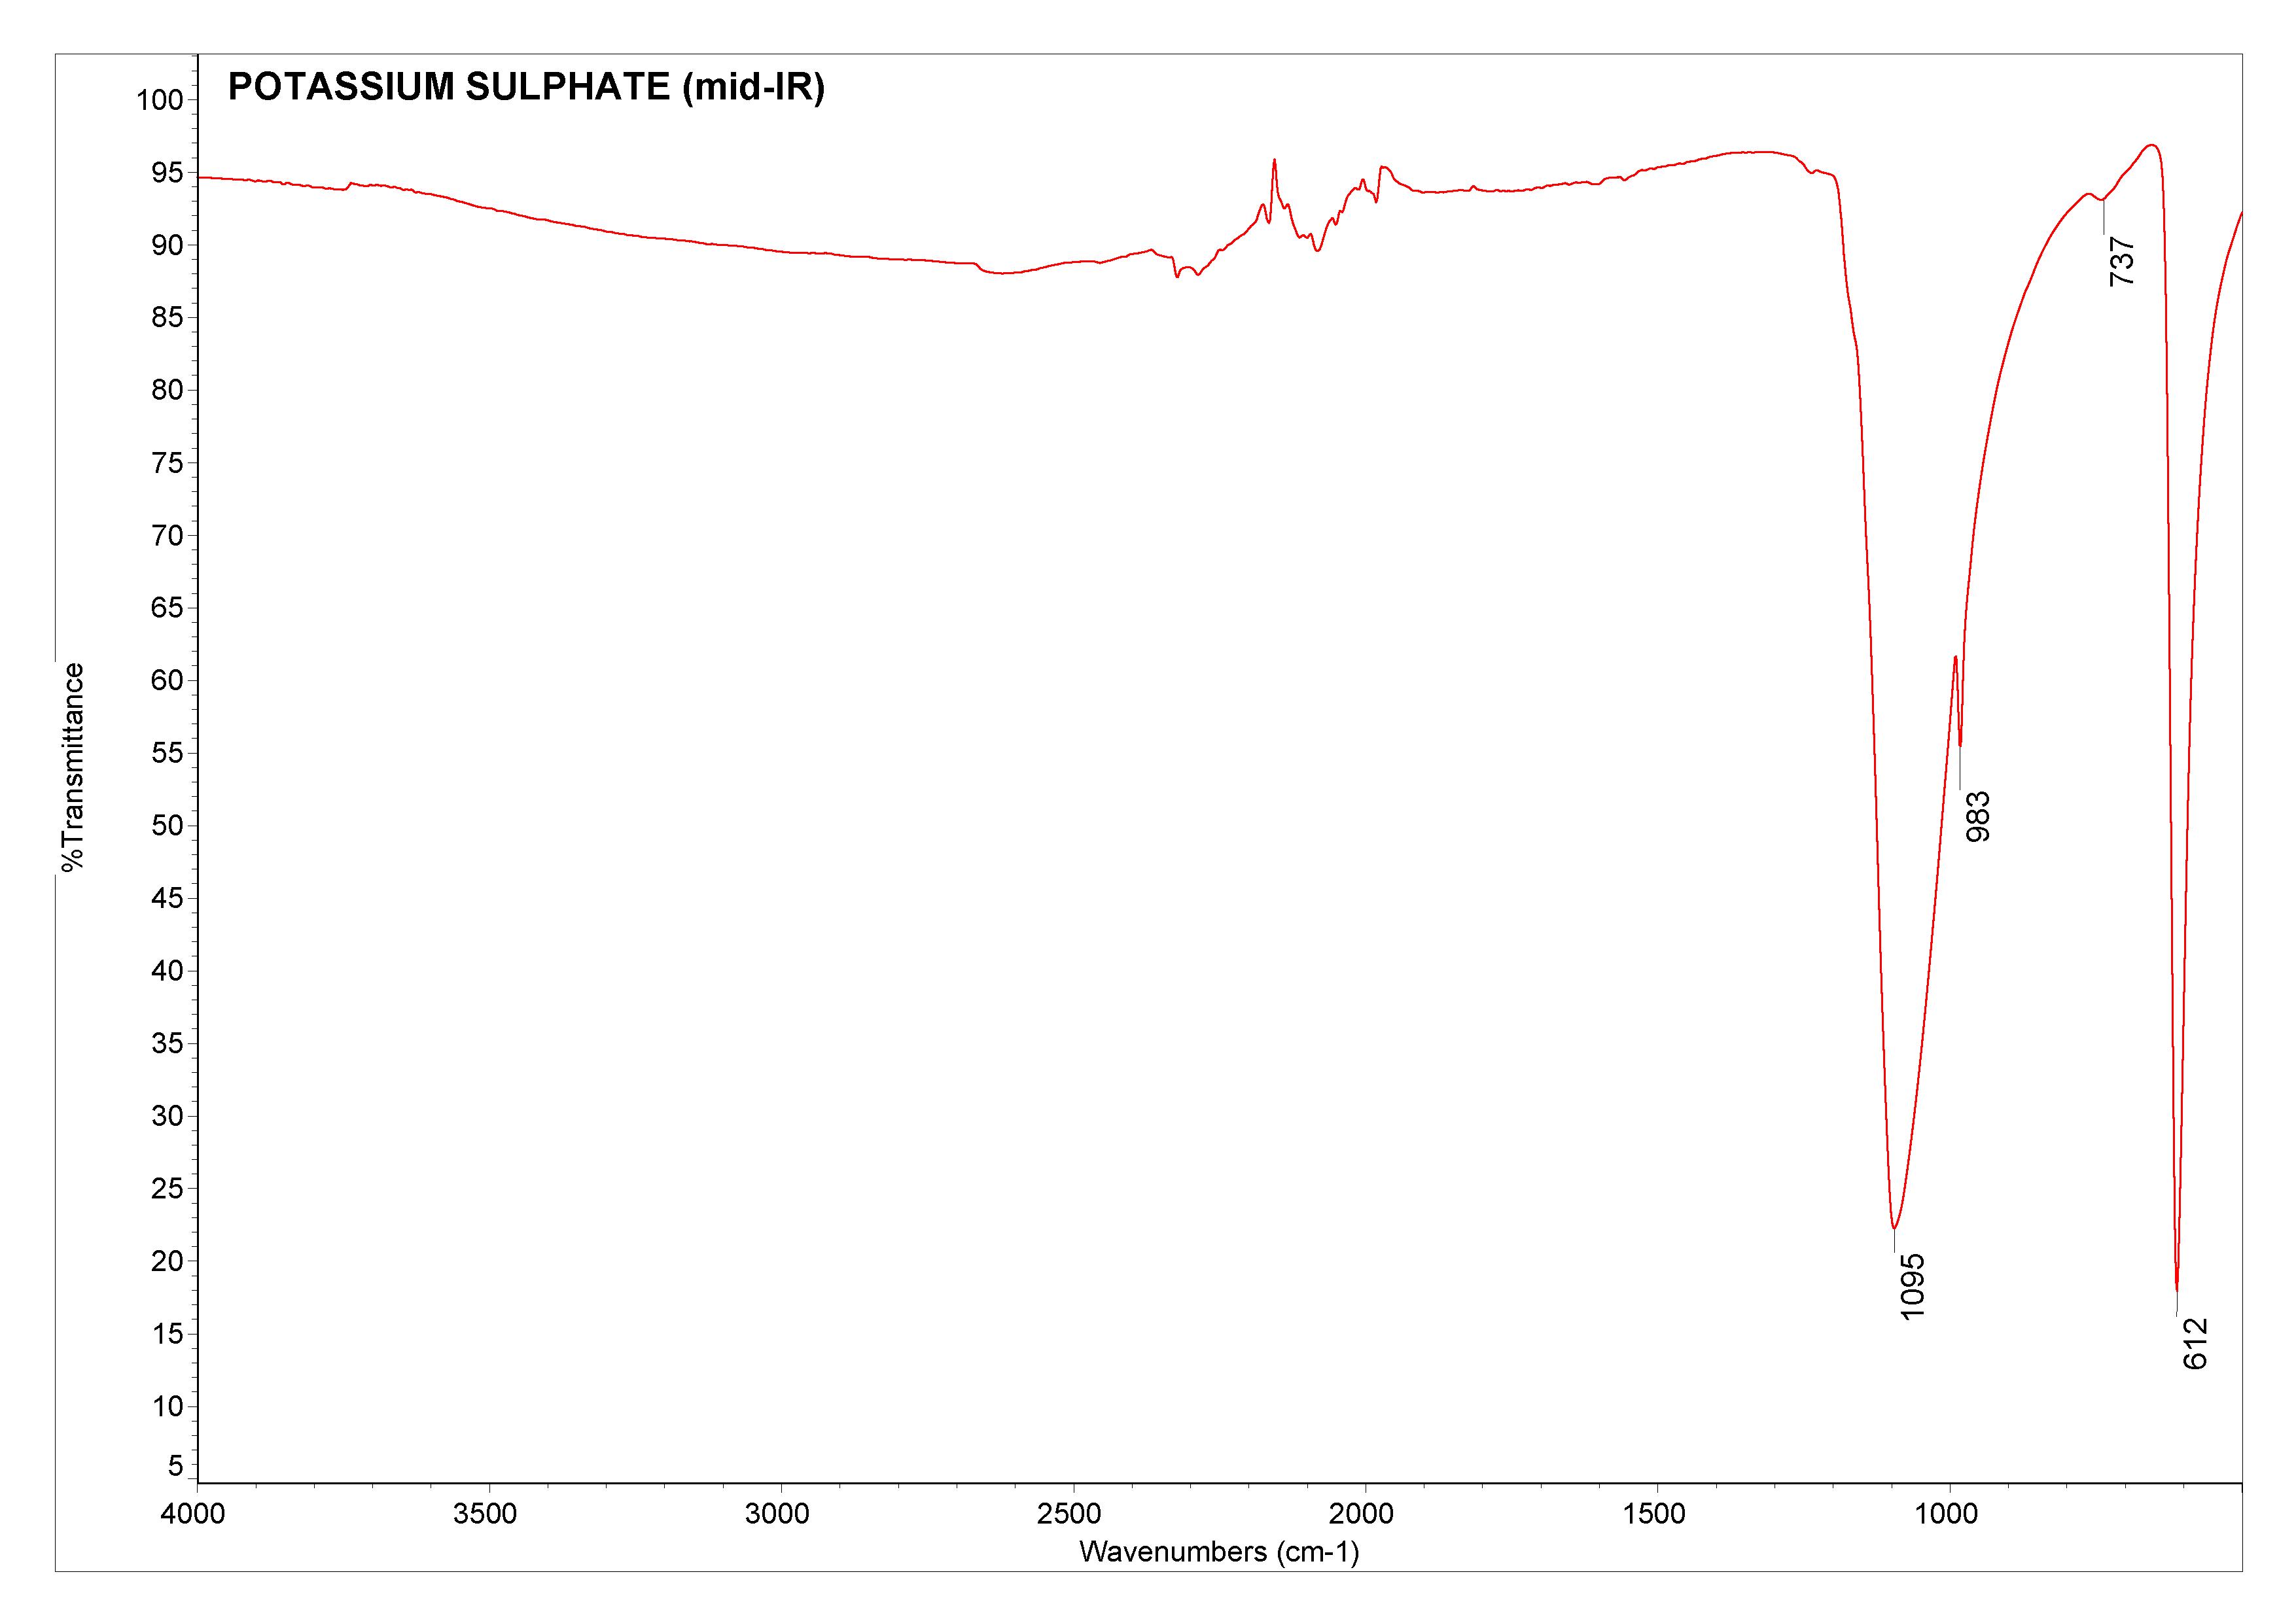 Potassium sulphate (mid-IR)